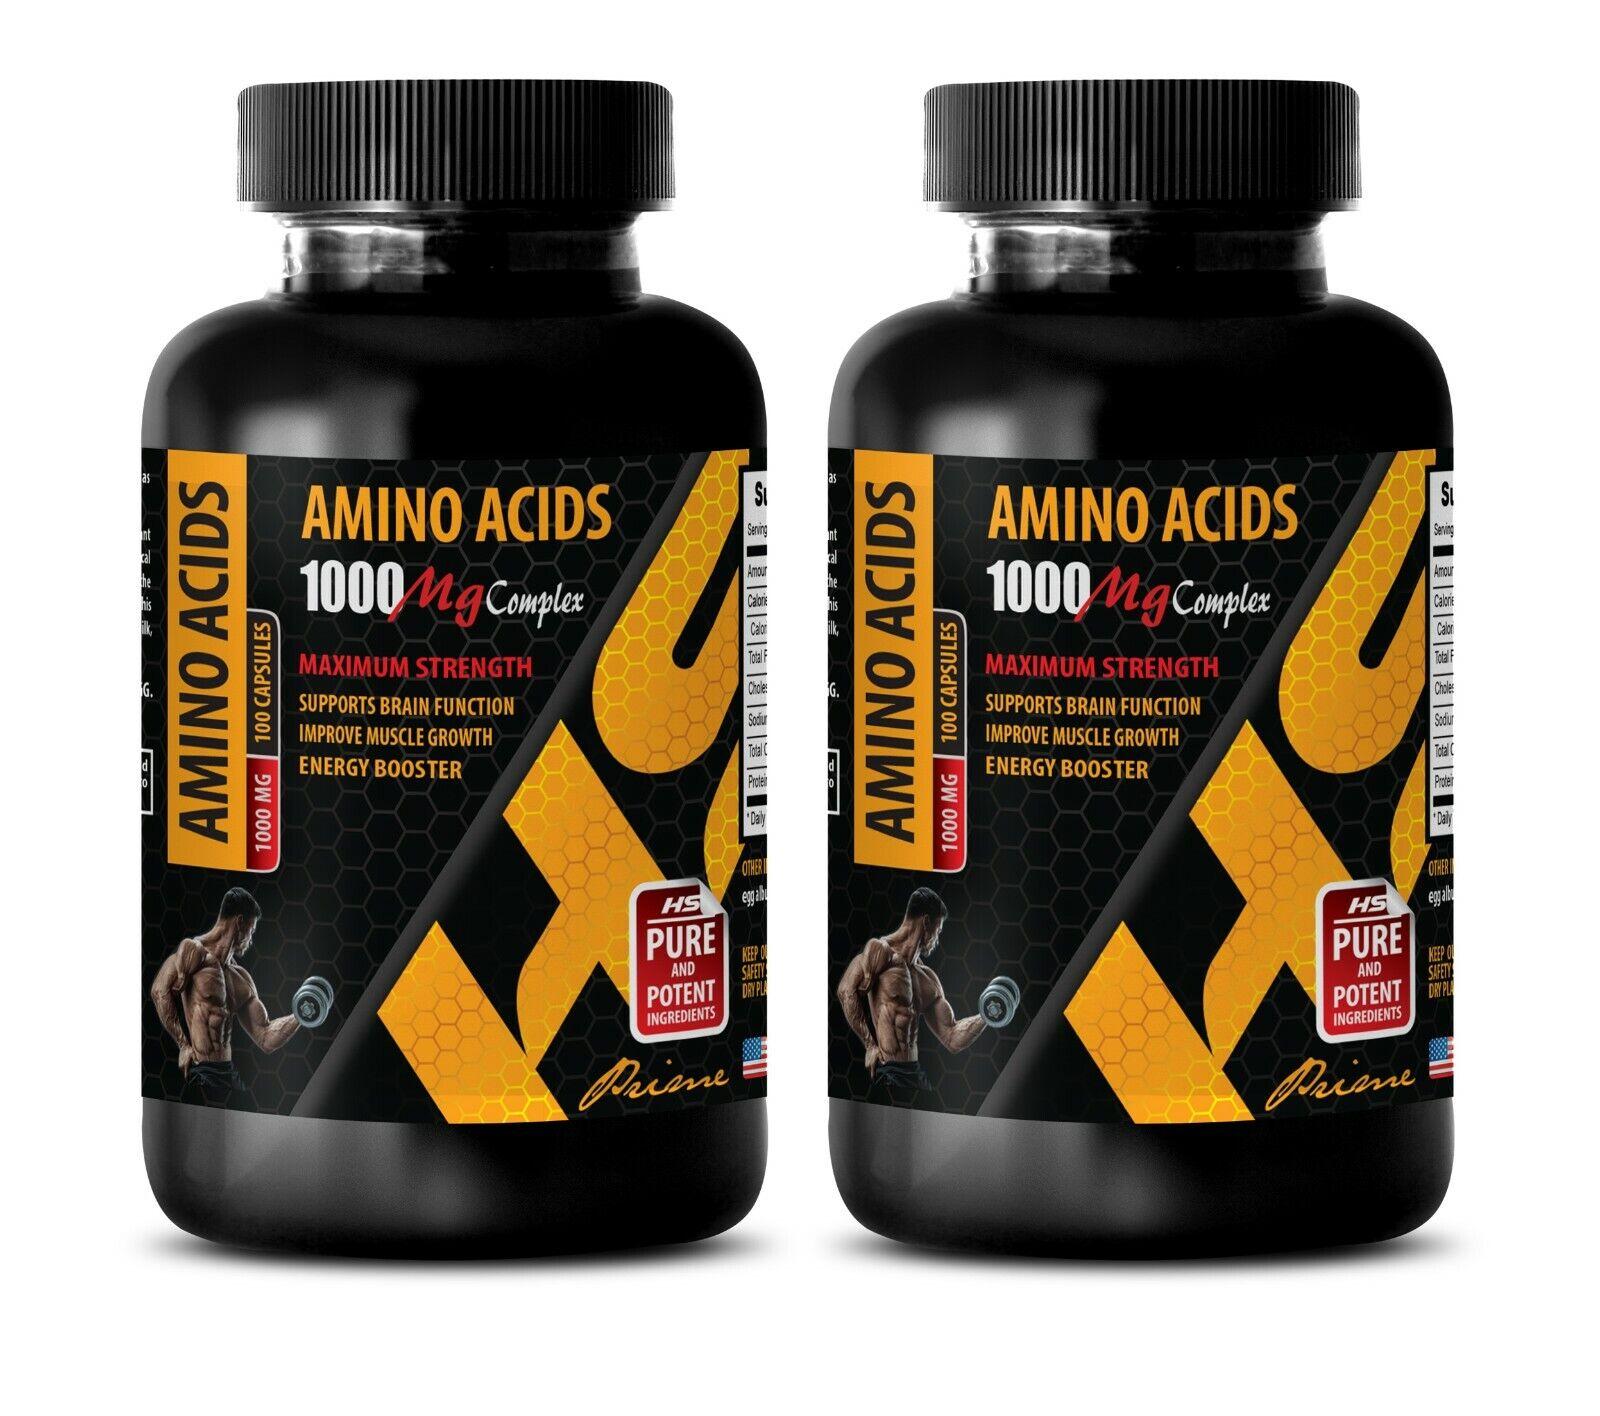 muscle enhancer for men - AMINO ACIDS 1000MG - amino acid bcaa 2B